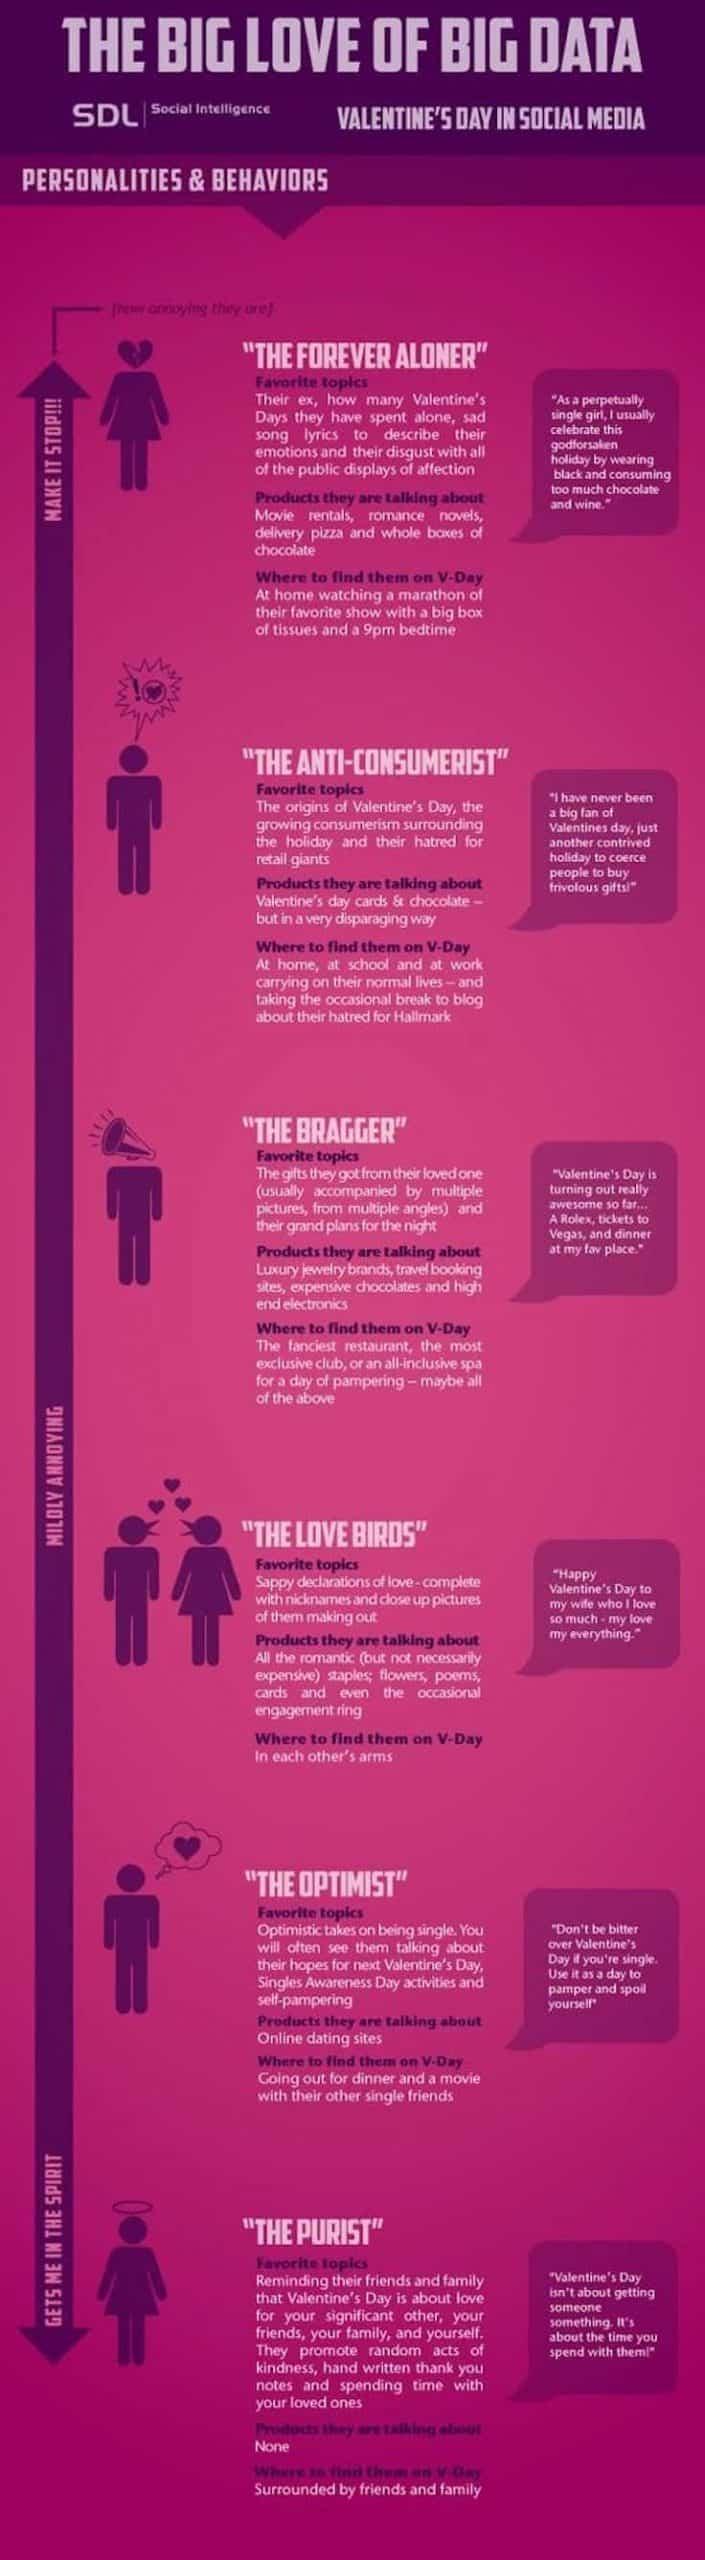 different-types-of-valentine-ppl-www-mediabistro-com_-6184430